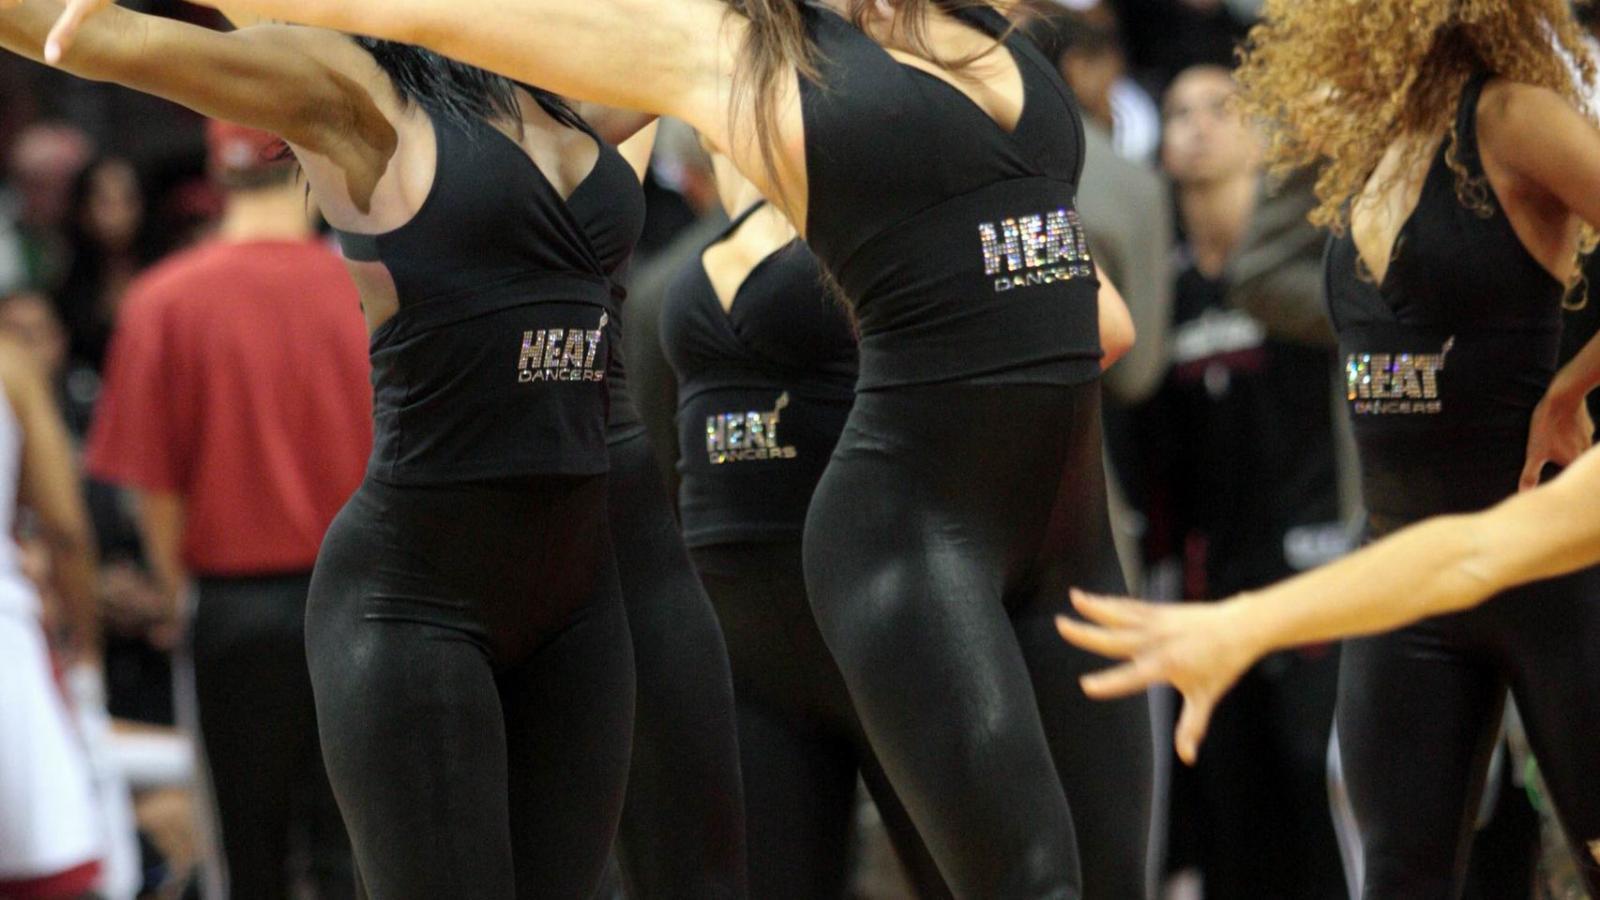 Miami Heat Dancers NBA cheerleaders   United States  USA Pictures HD Wallpaper